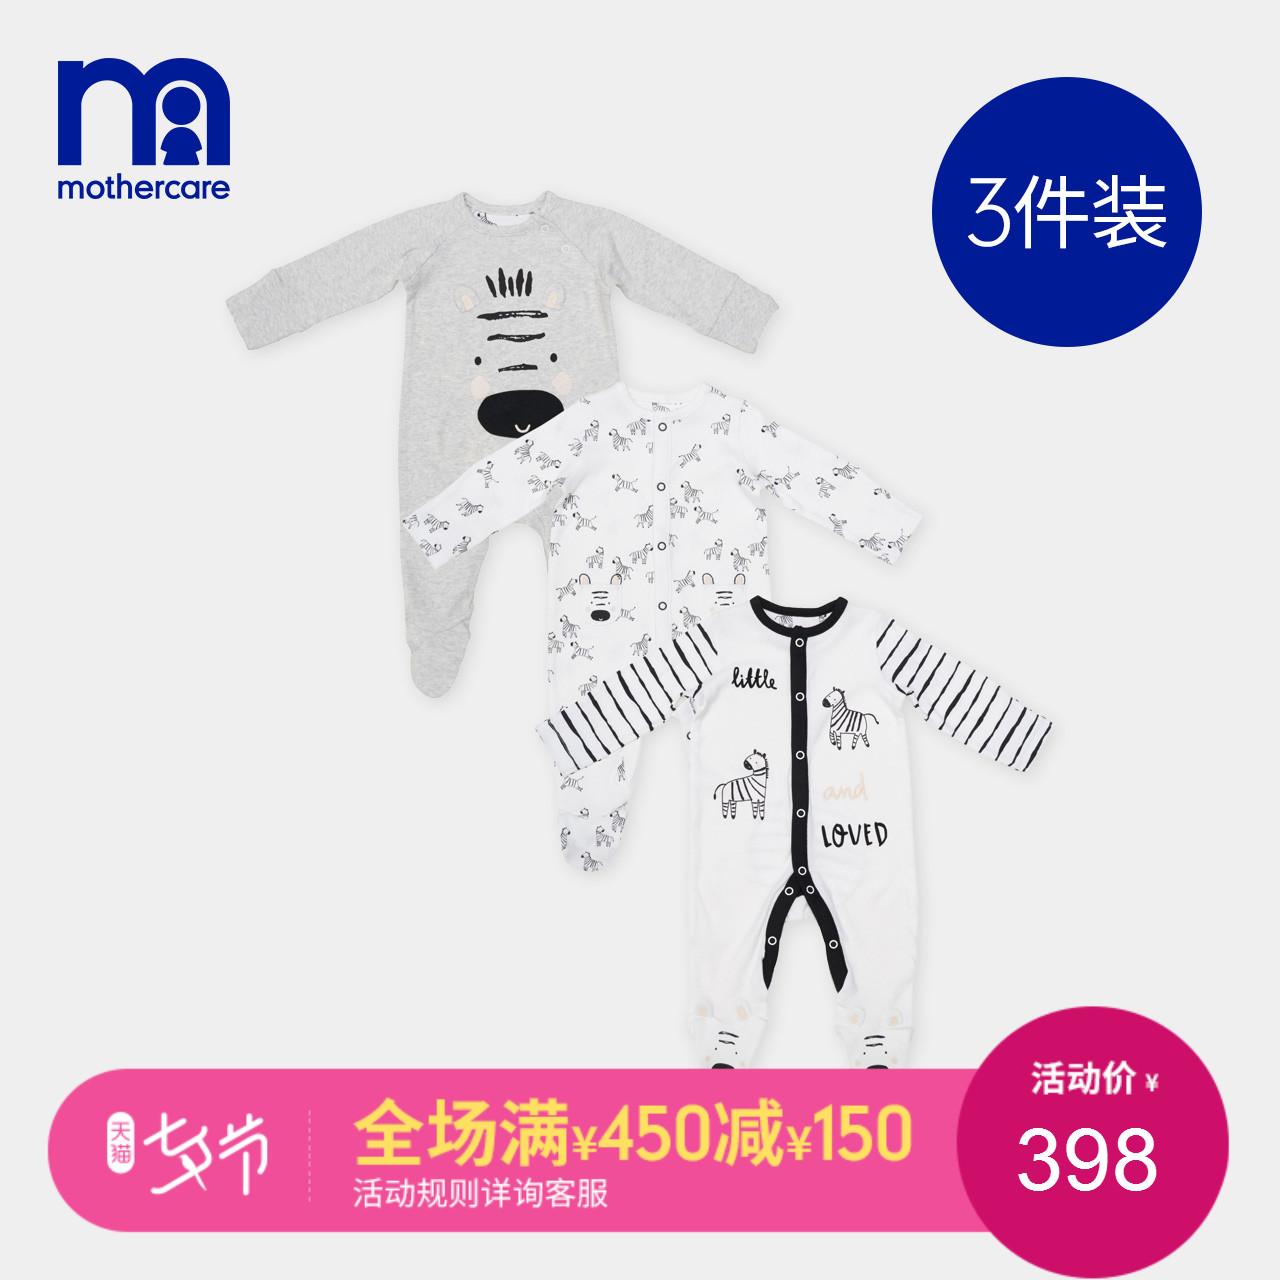 mothercare英国婴儿针织连体衣3件装新生儿宝宝棉质长袖哈衣